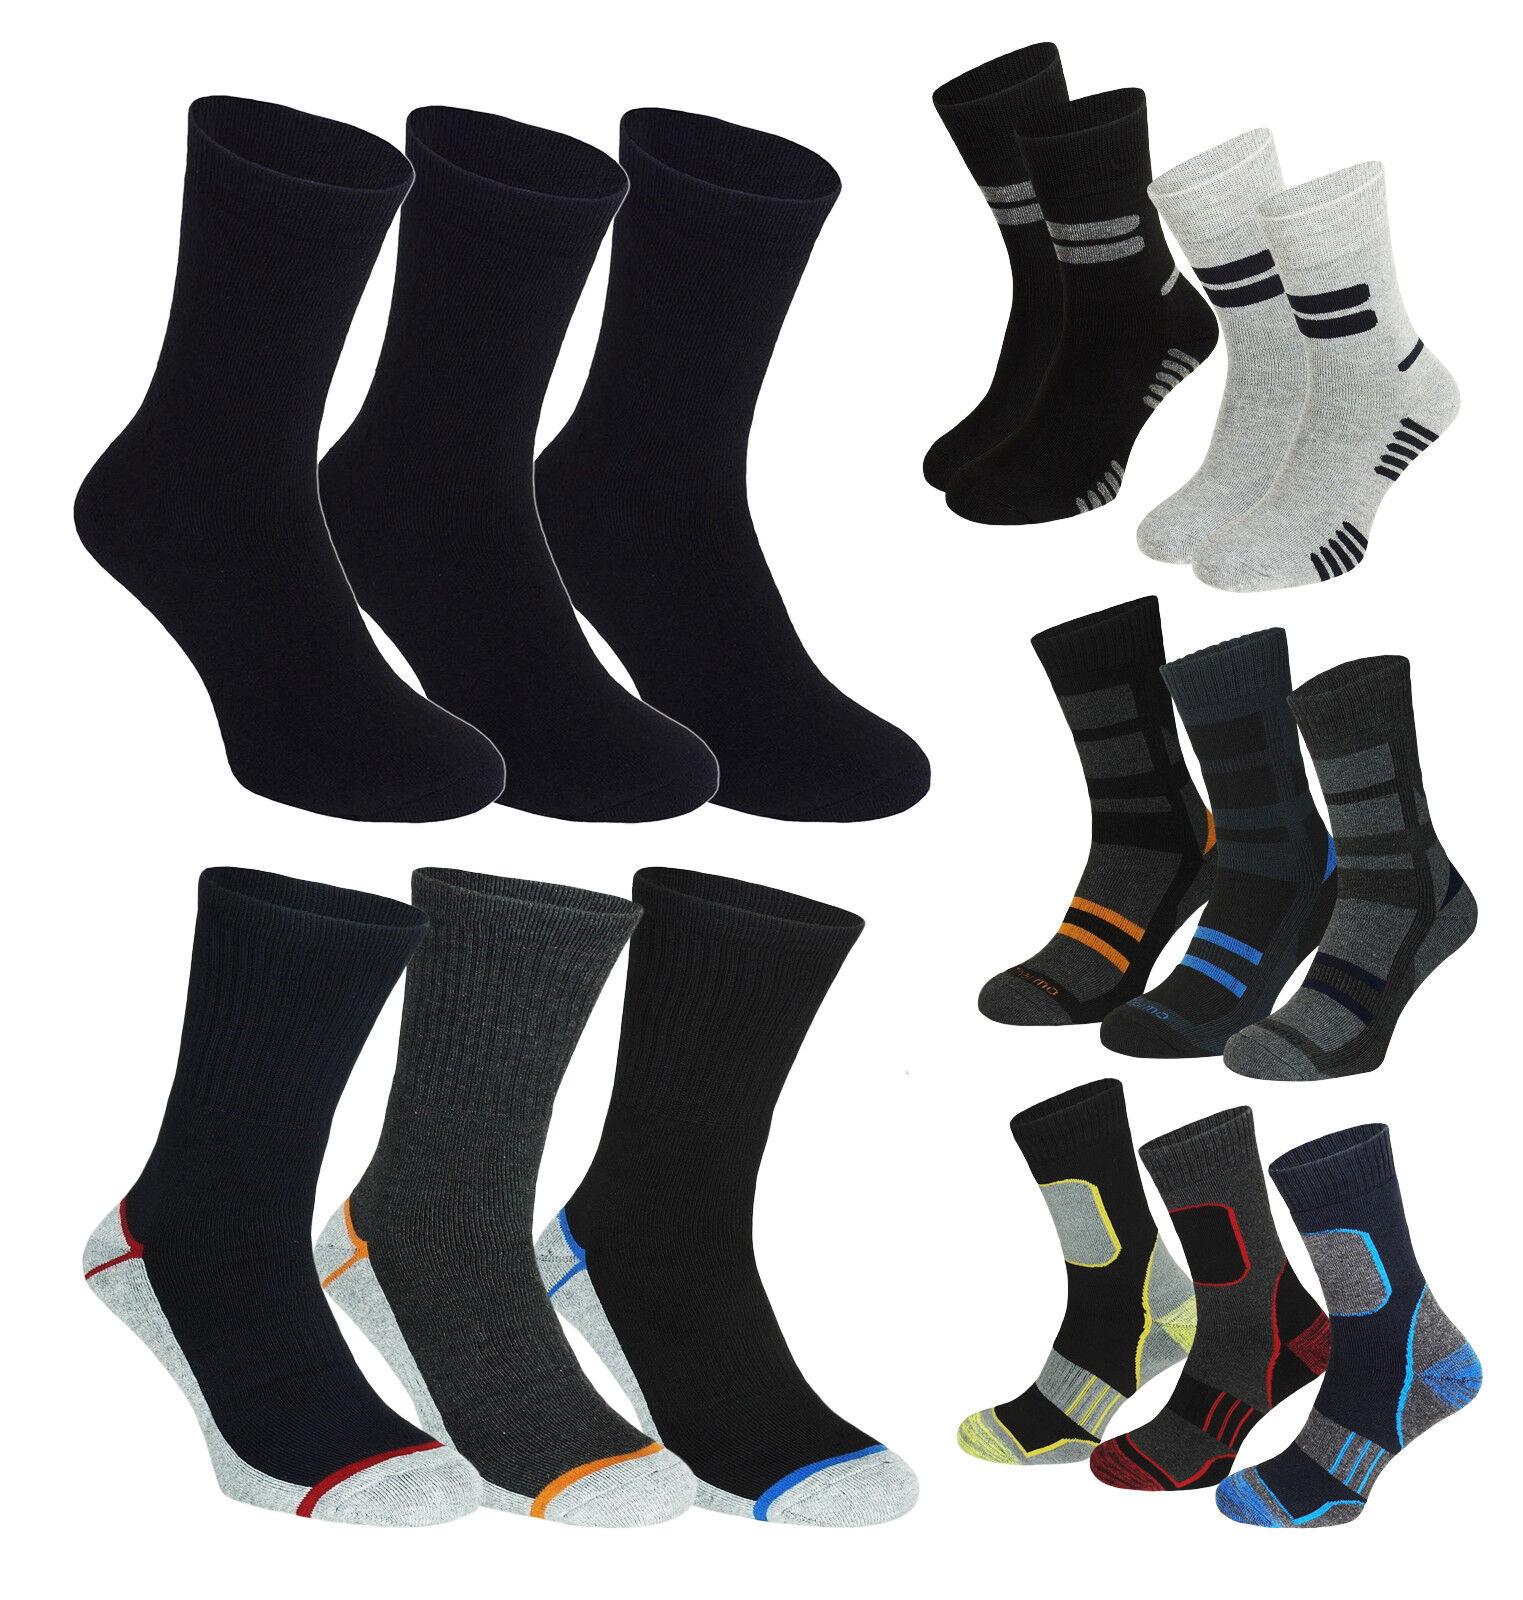 12-24 Paar Thermo Socken Warme Arbeit Winter Socken Ski Herren Damen Schwarz NEU